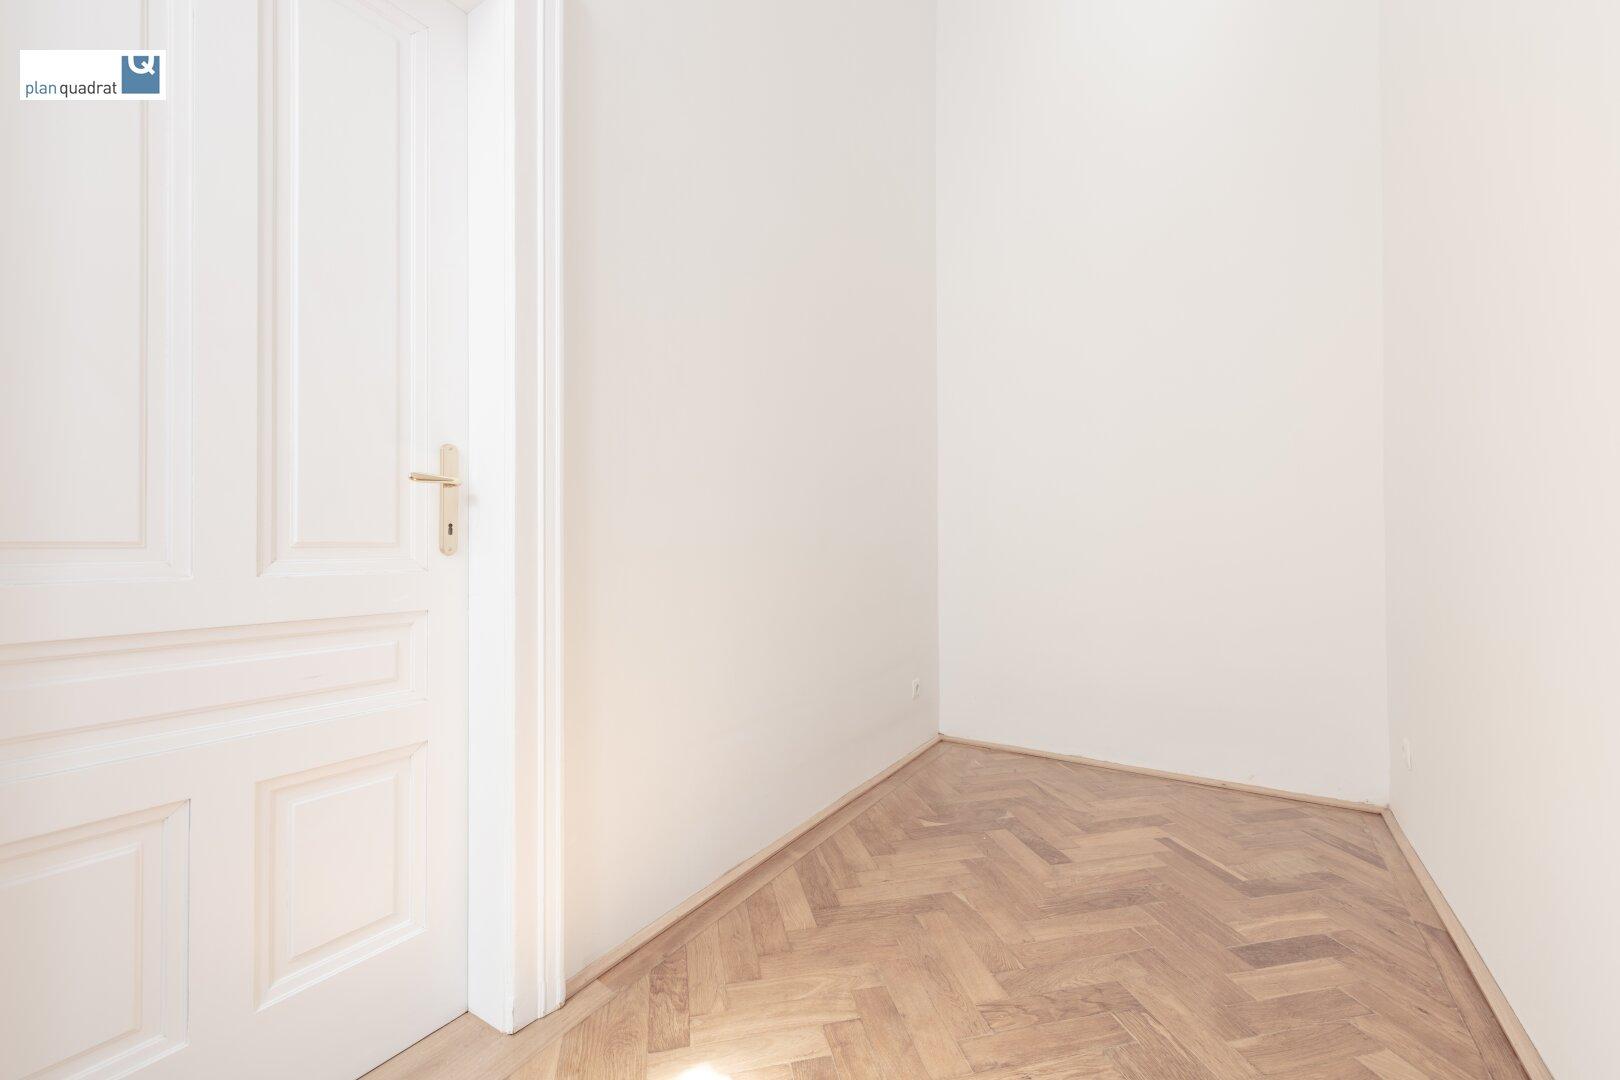 Raum 8 (gem. Grunsrissskizze - ca. 6,40 qm)